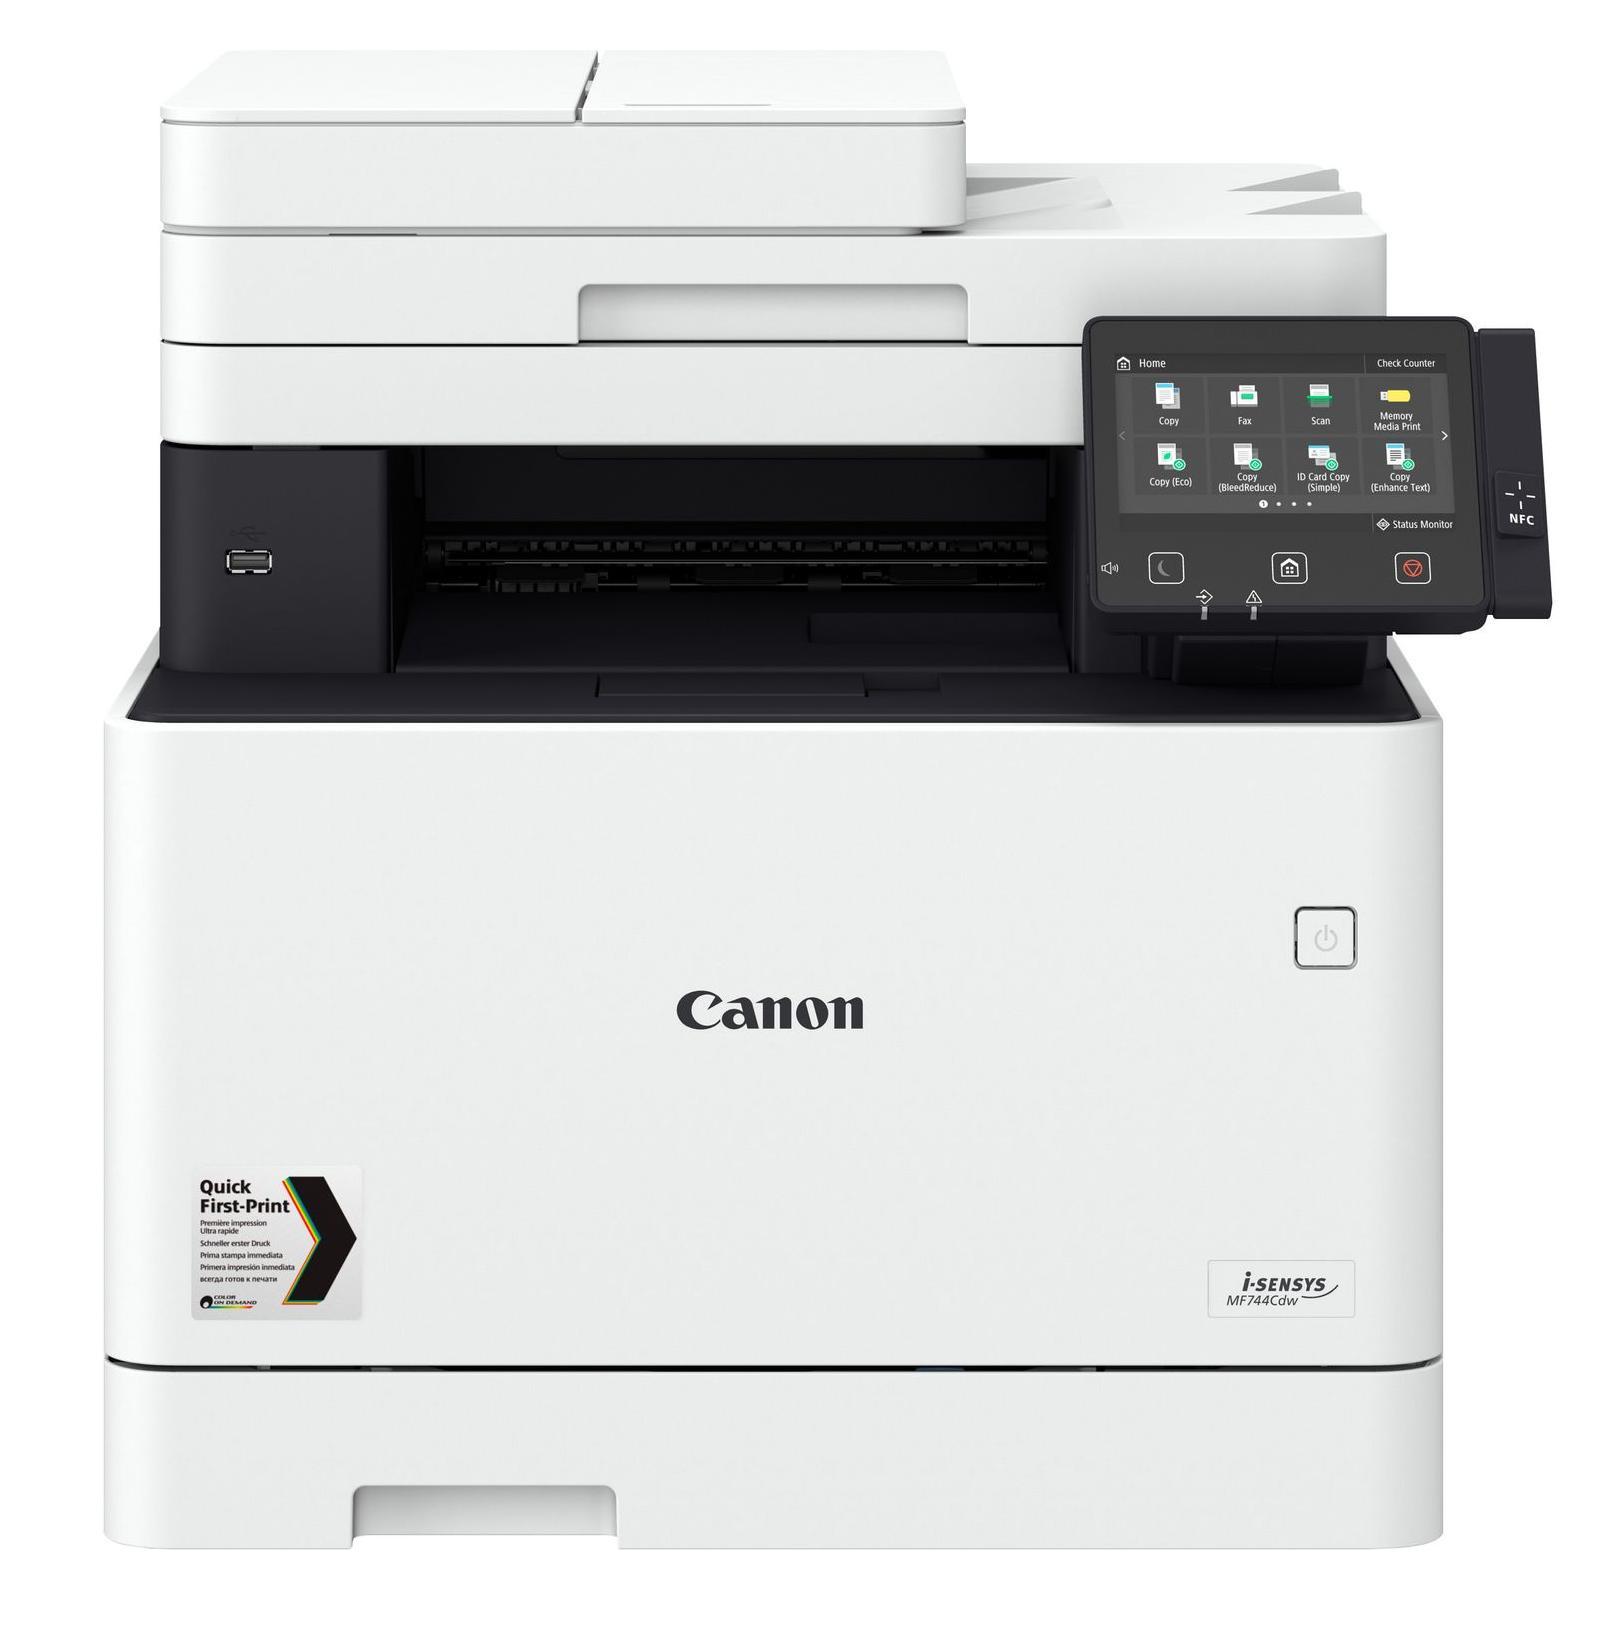 Canon i-SENSYS MF744Cdw Laser A4 1200 x 1200 DPI 27 ppm Wi-Fi